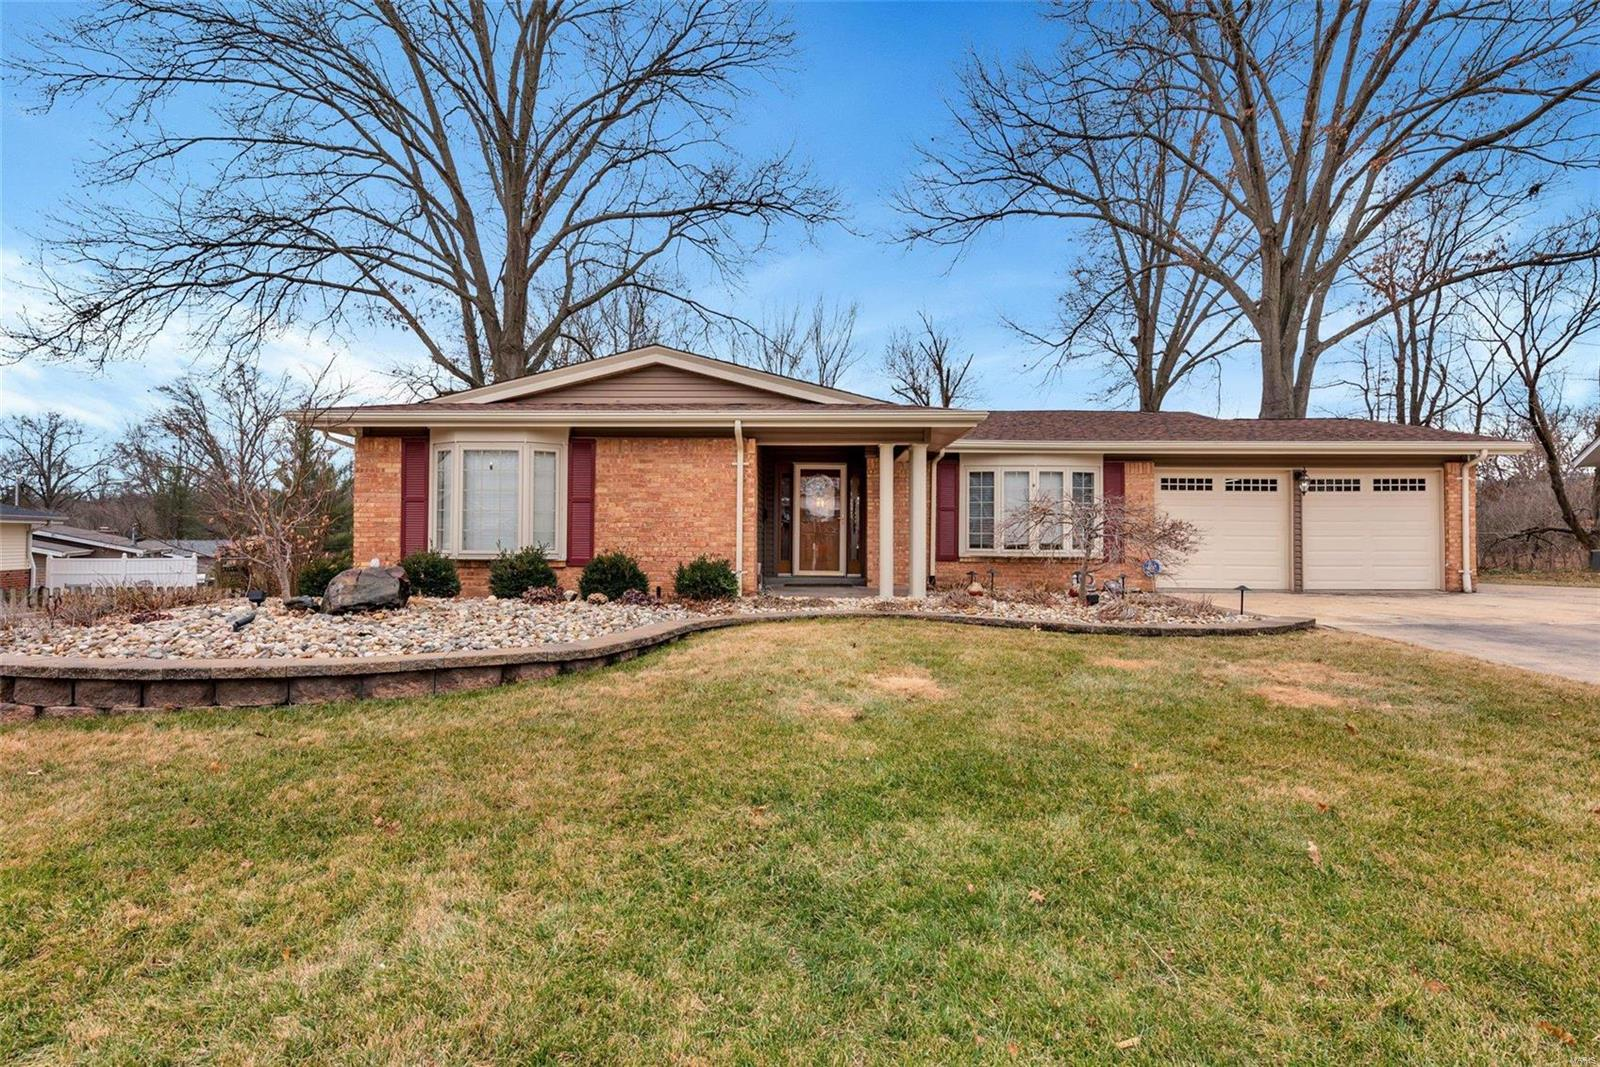 101 Little Hill Property Photo - Ballwin, MO real estate listing